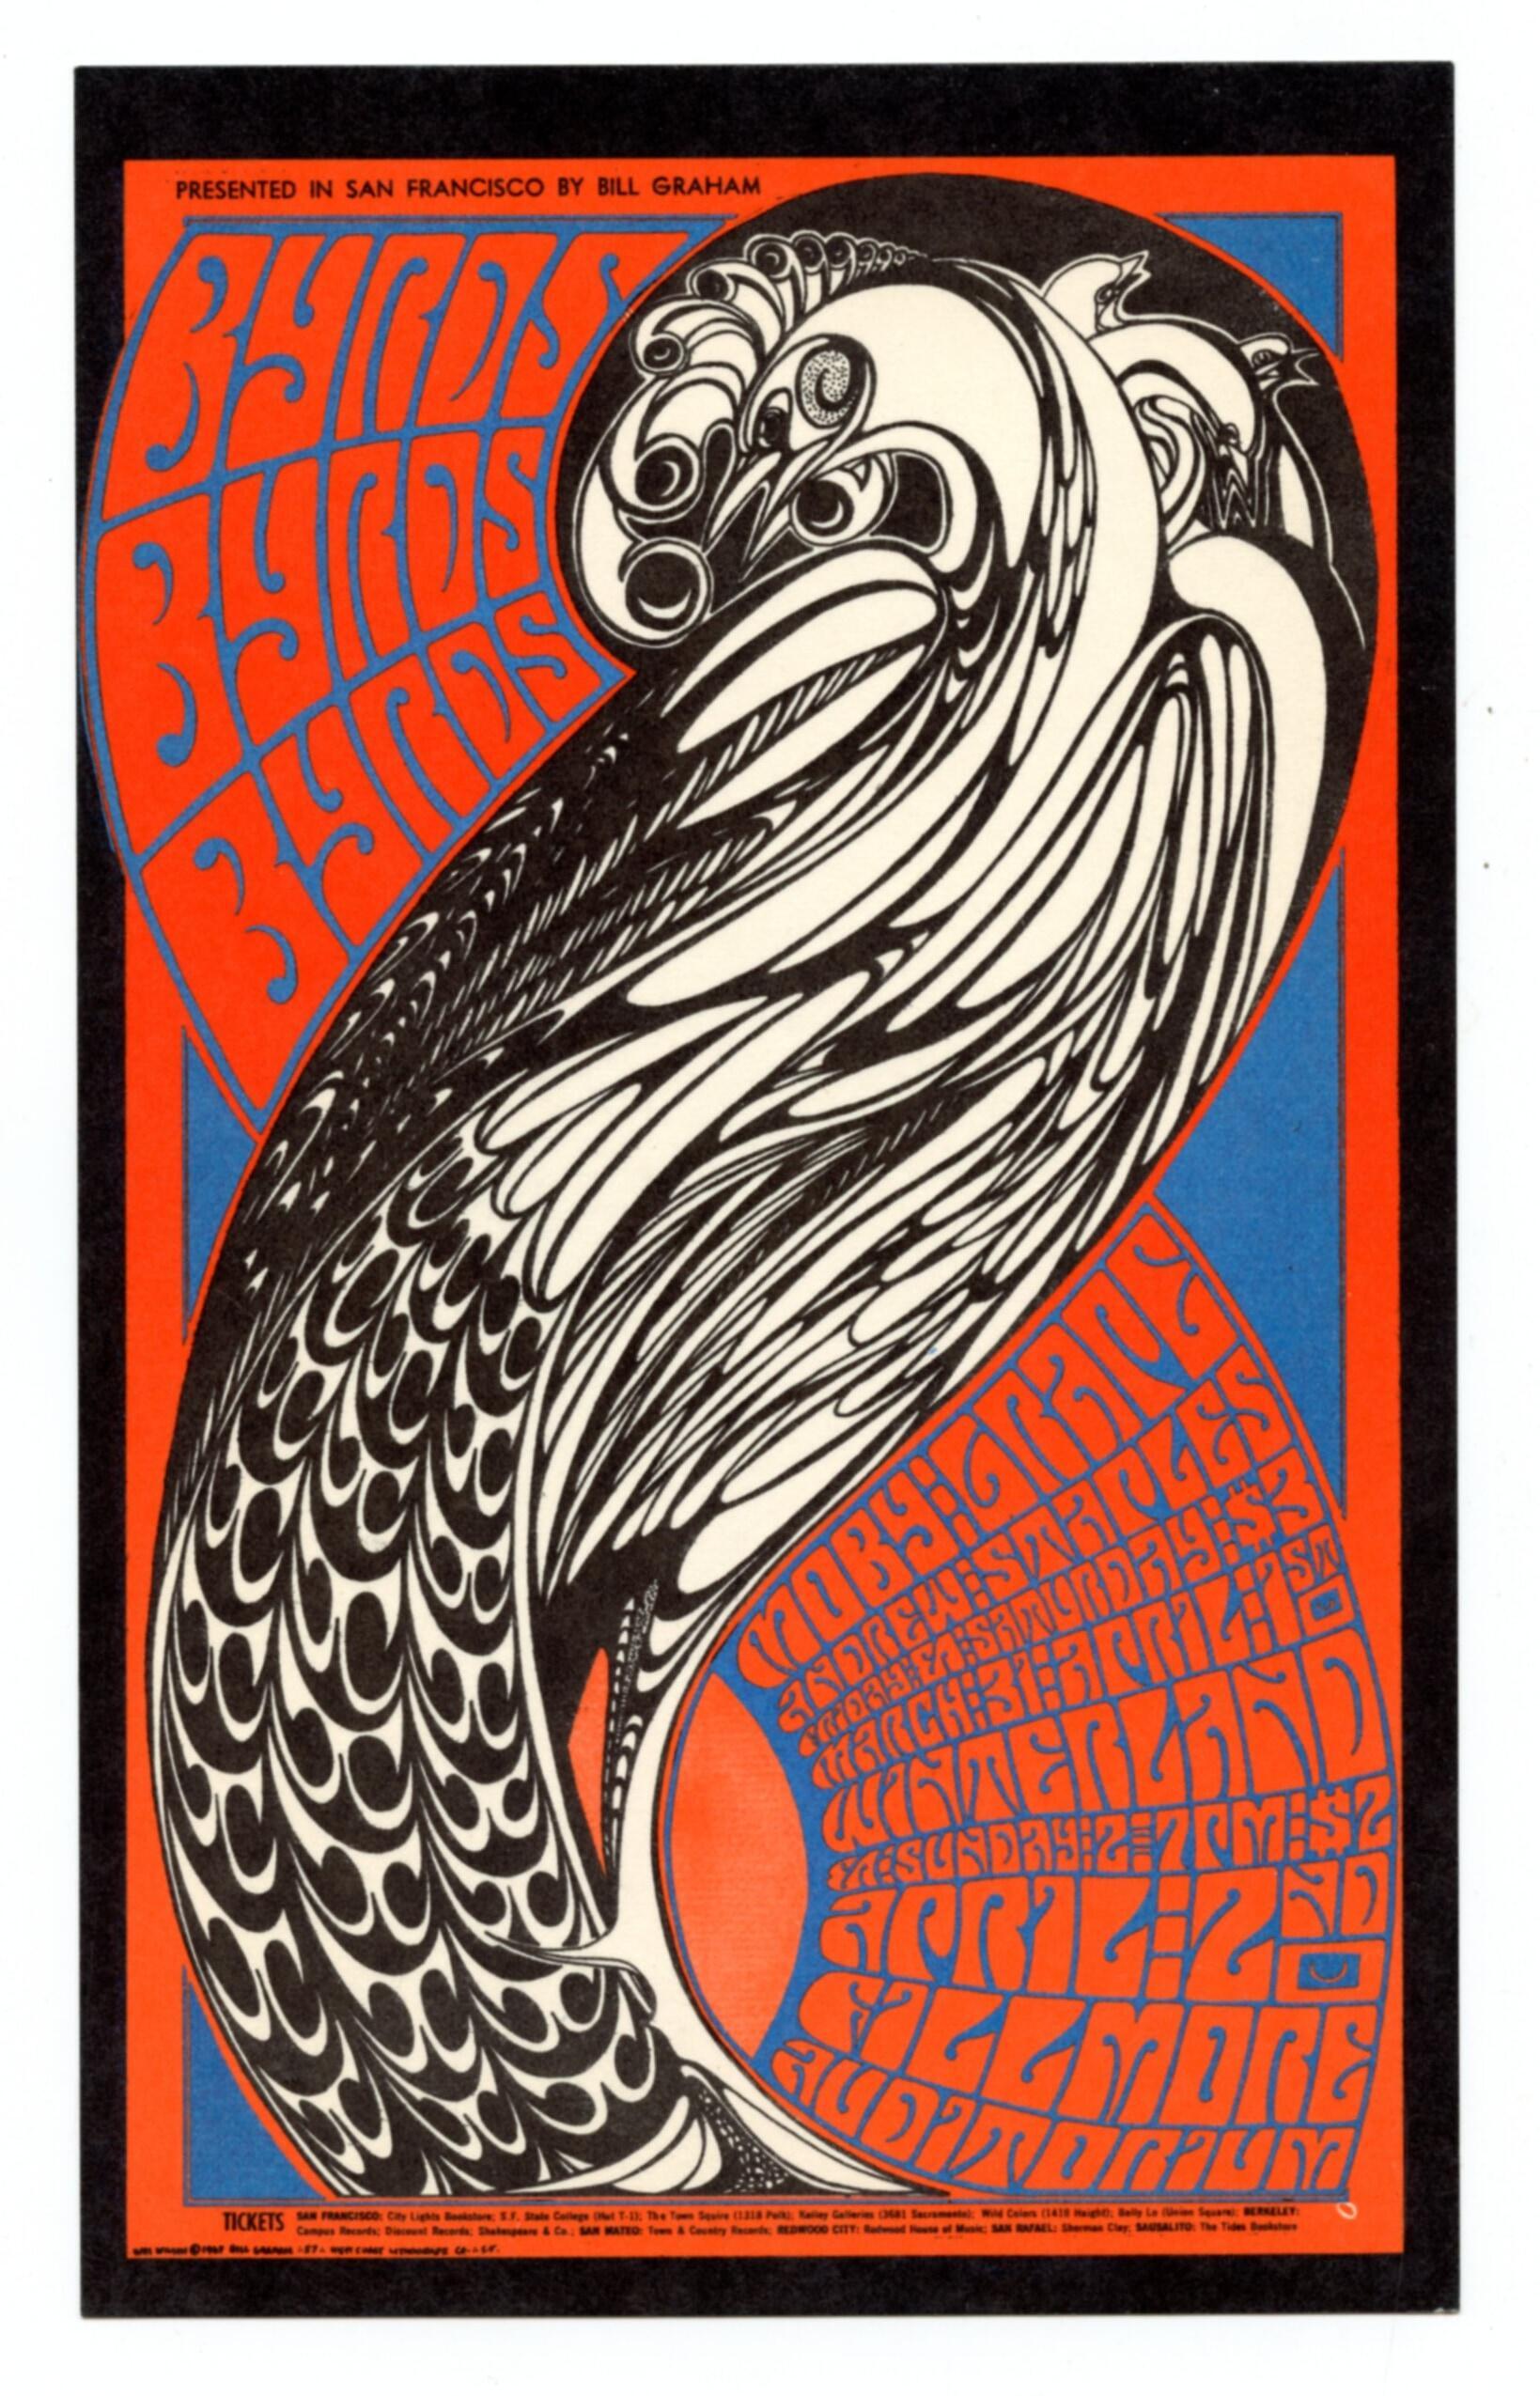 BG  57 Postcard Byrds Moby Grape Andrew Staples 1967 Mar 31